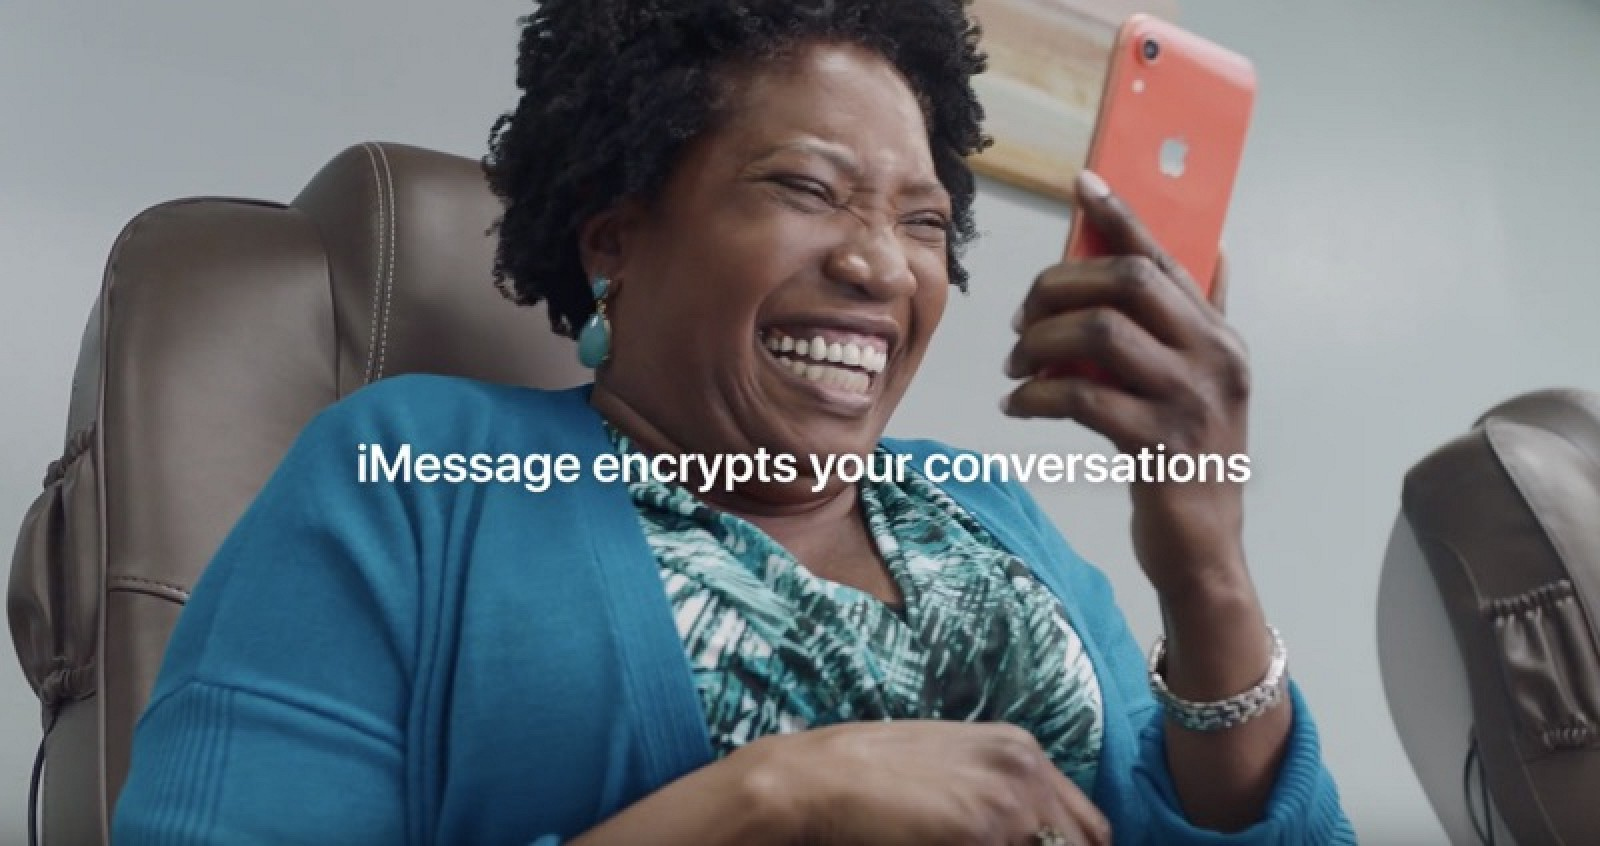 Apple Shares New 'Inside Joke' Privacy-Focused Video Highlighting iMessage Encryption